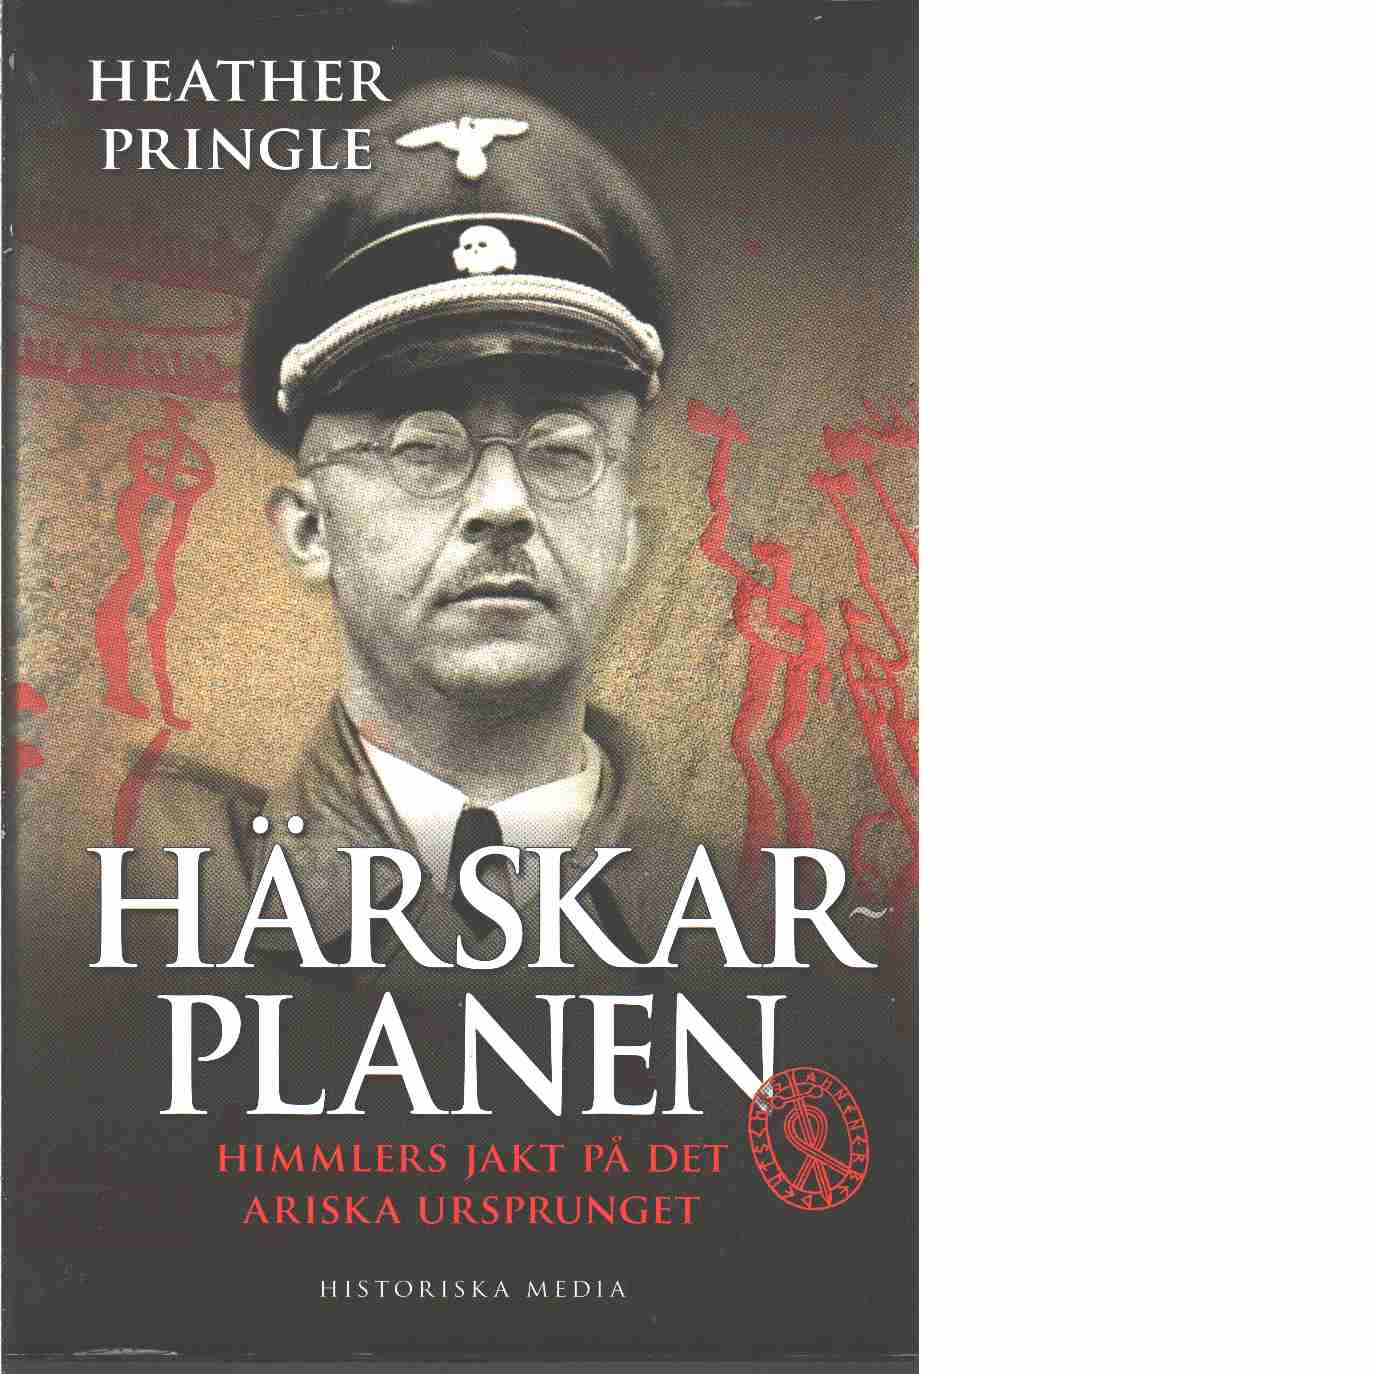 Härskarplanen : Himmlers jakt på det ariska ursprunget  - Pringle, Heather Anne